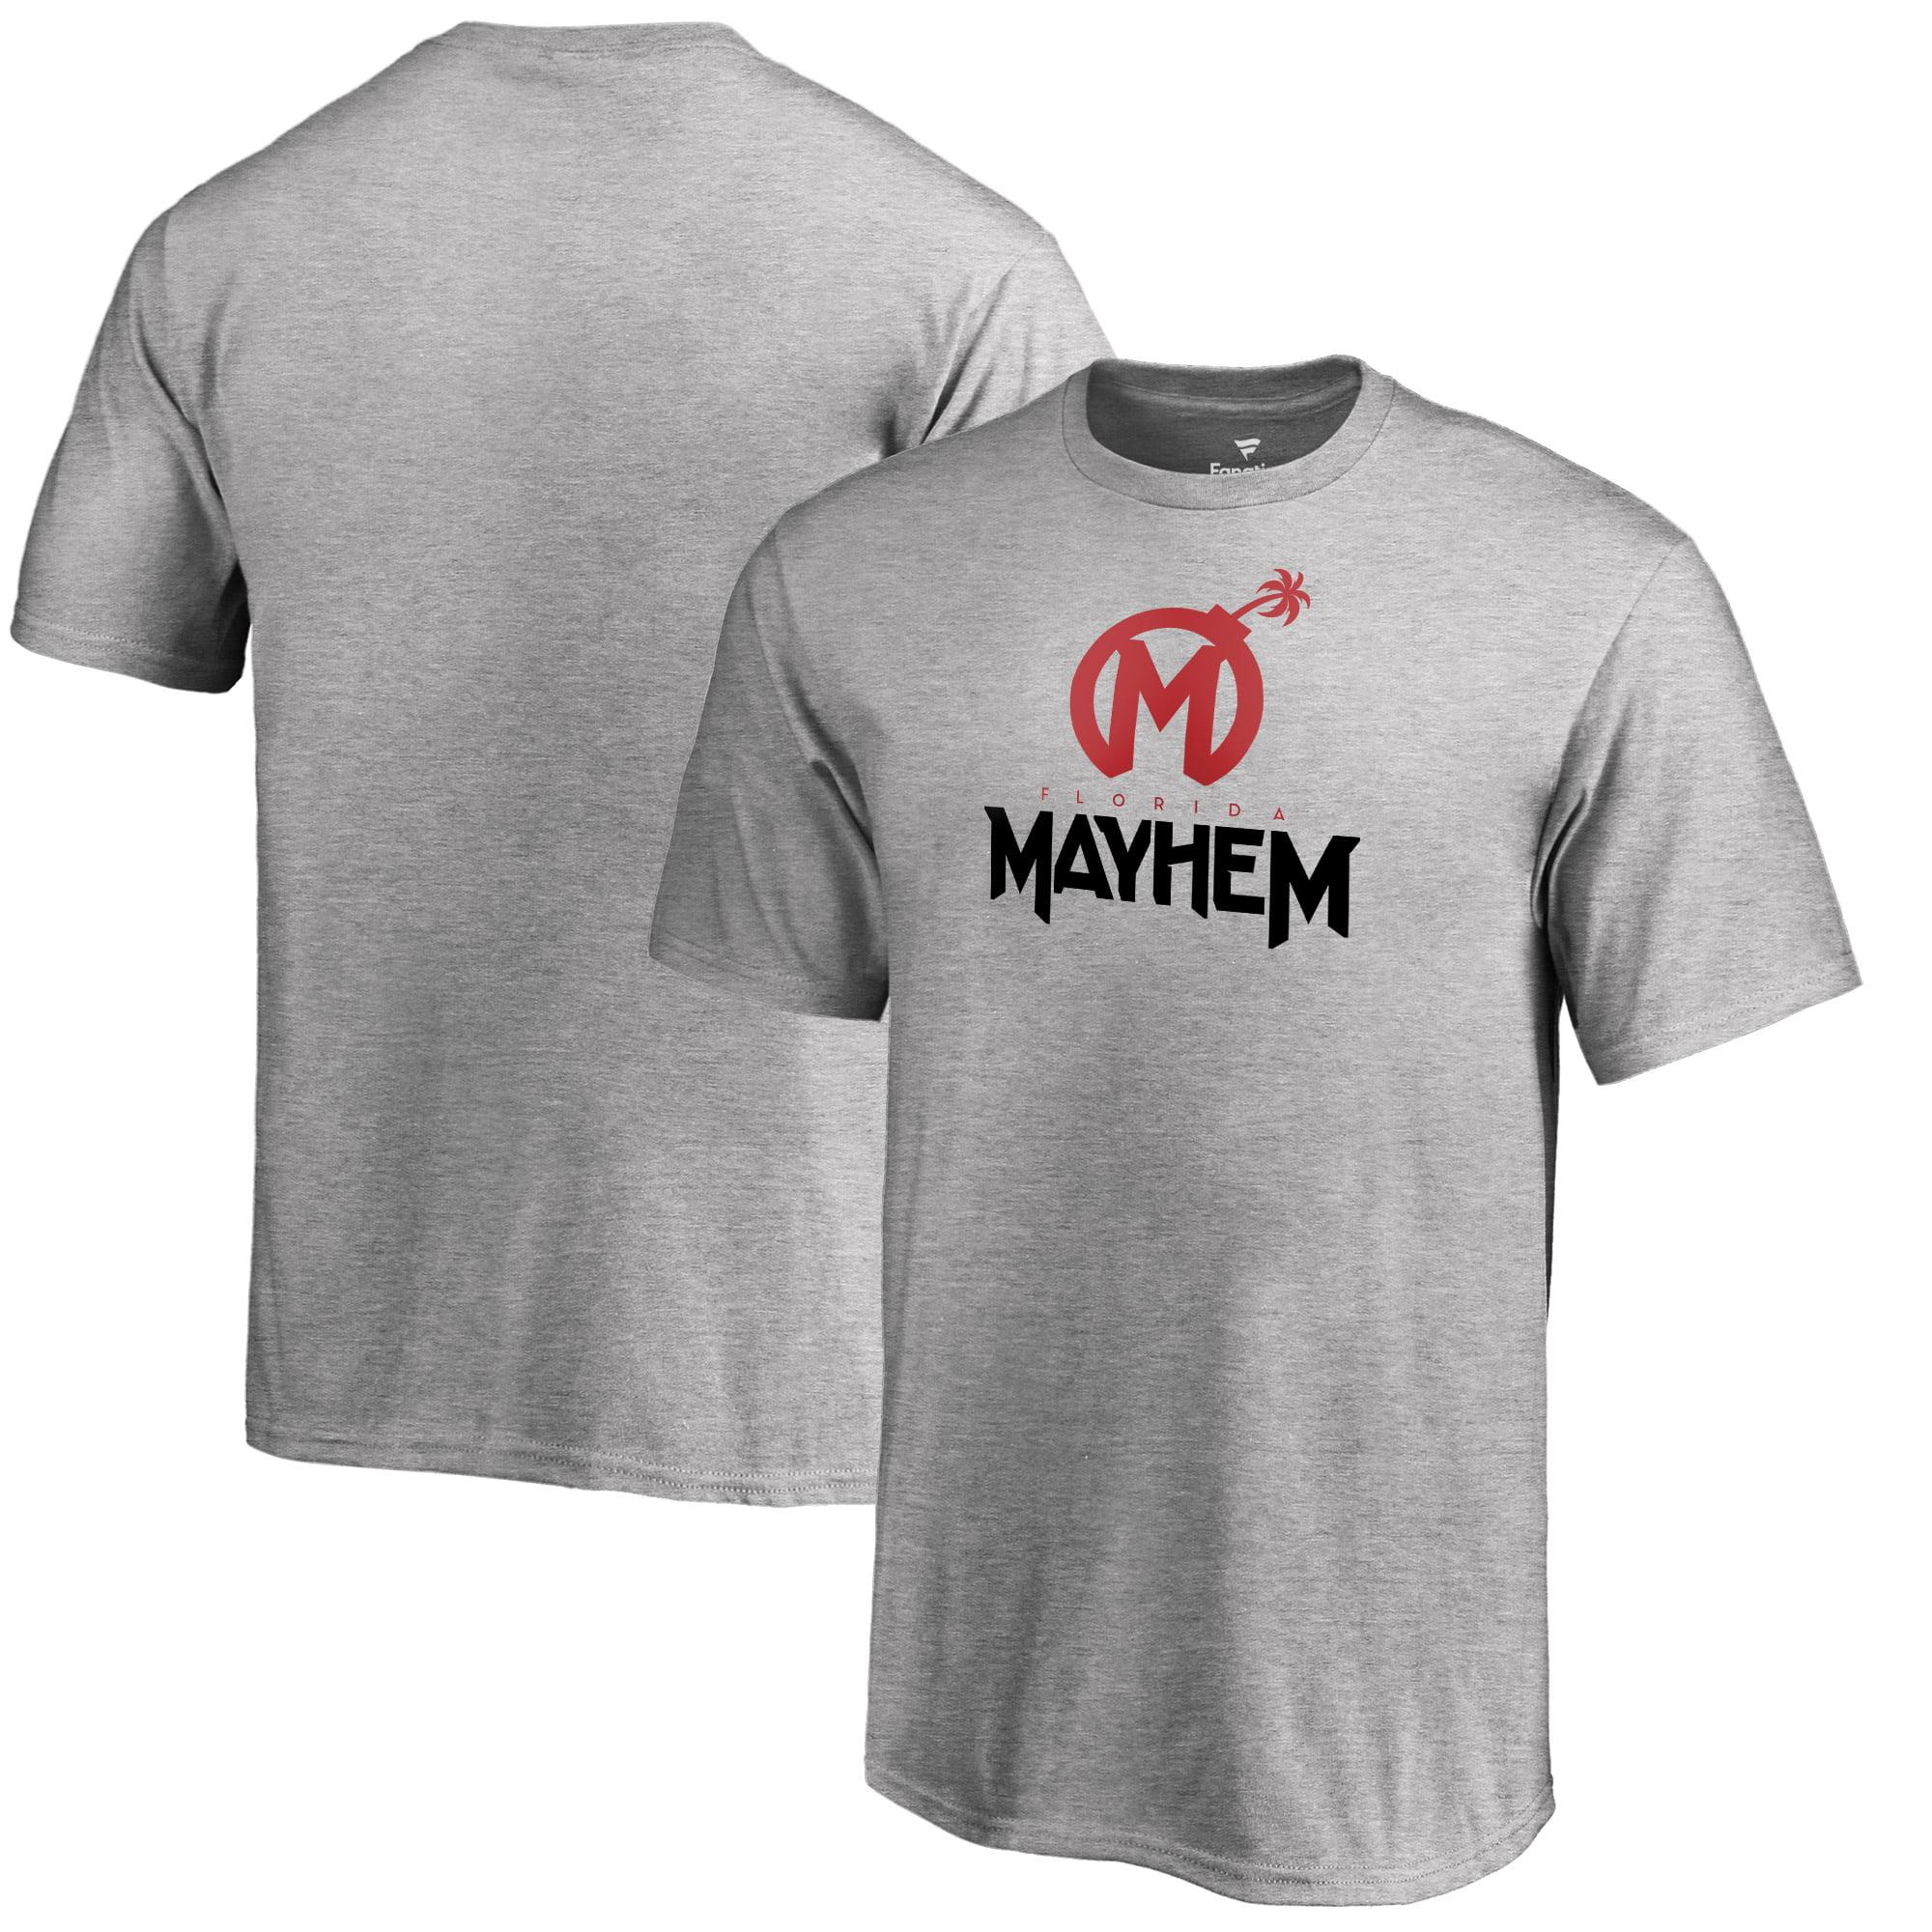 Florida Mayhem Fanatics Branded Youth Team Identity T-Shirt - Heathered Gray